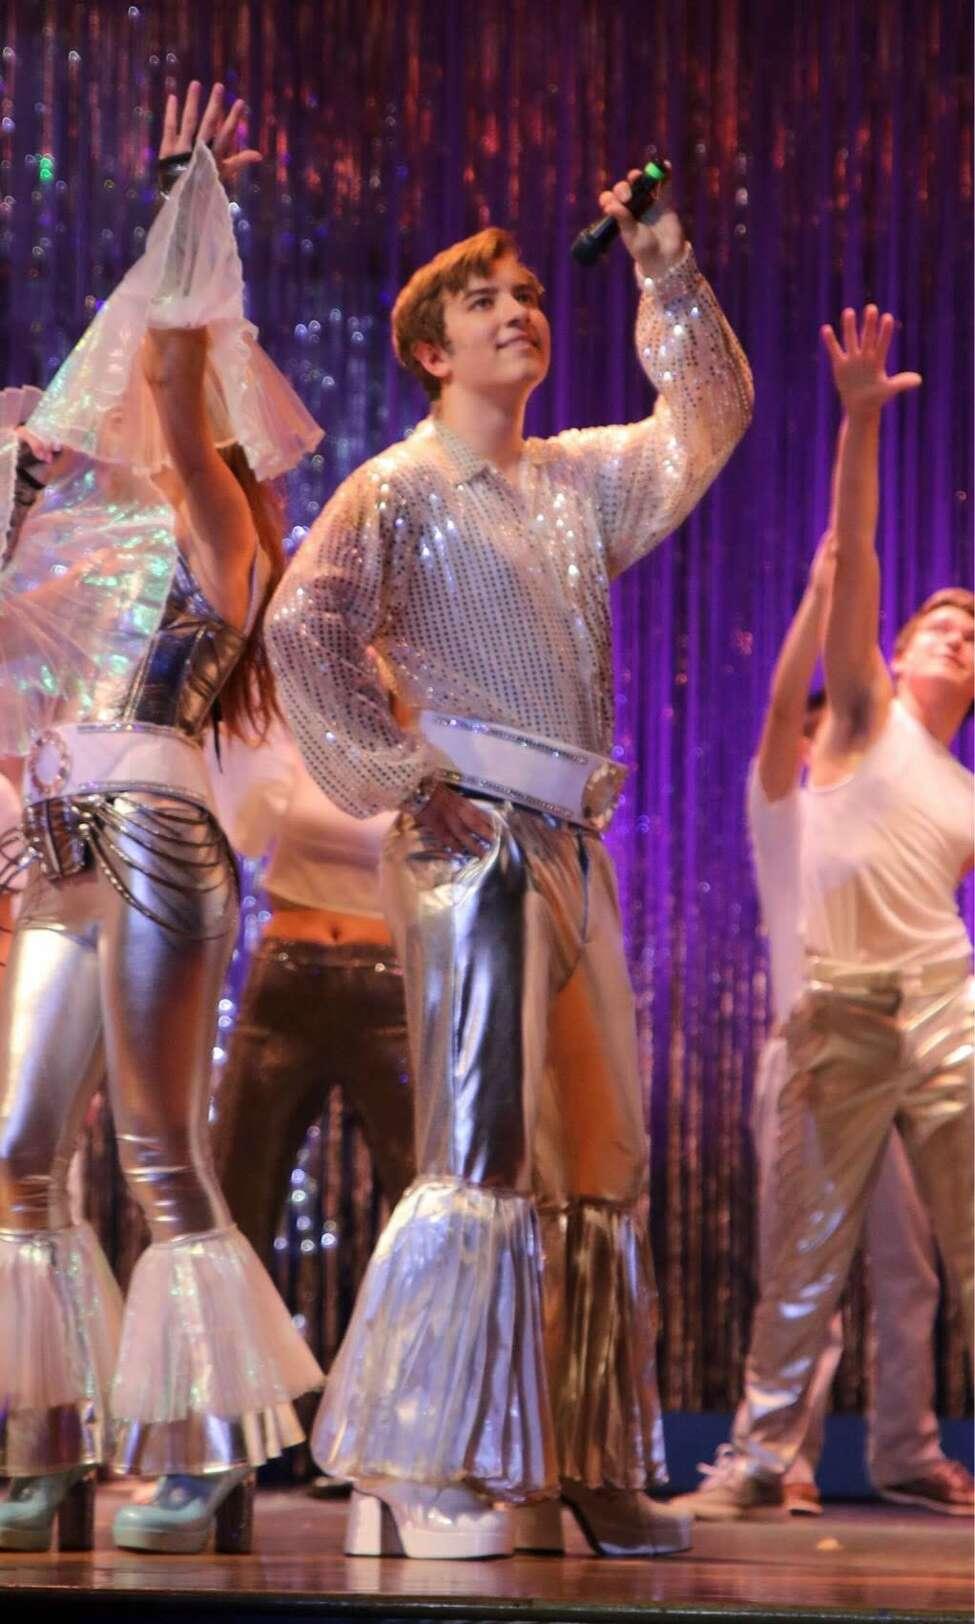 Performances of Voorheesville High School's production of